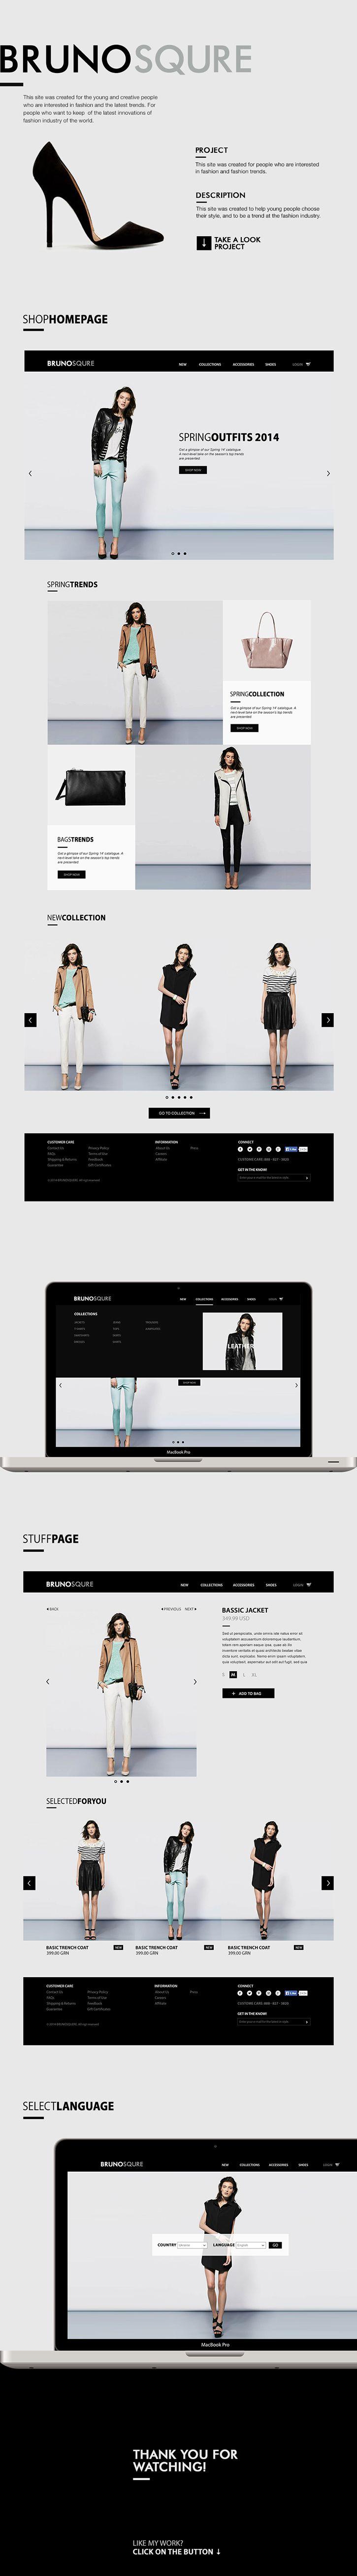 Brunosqure website